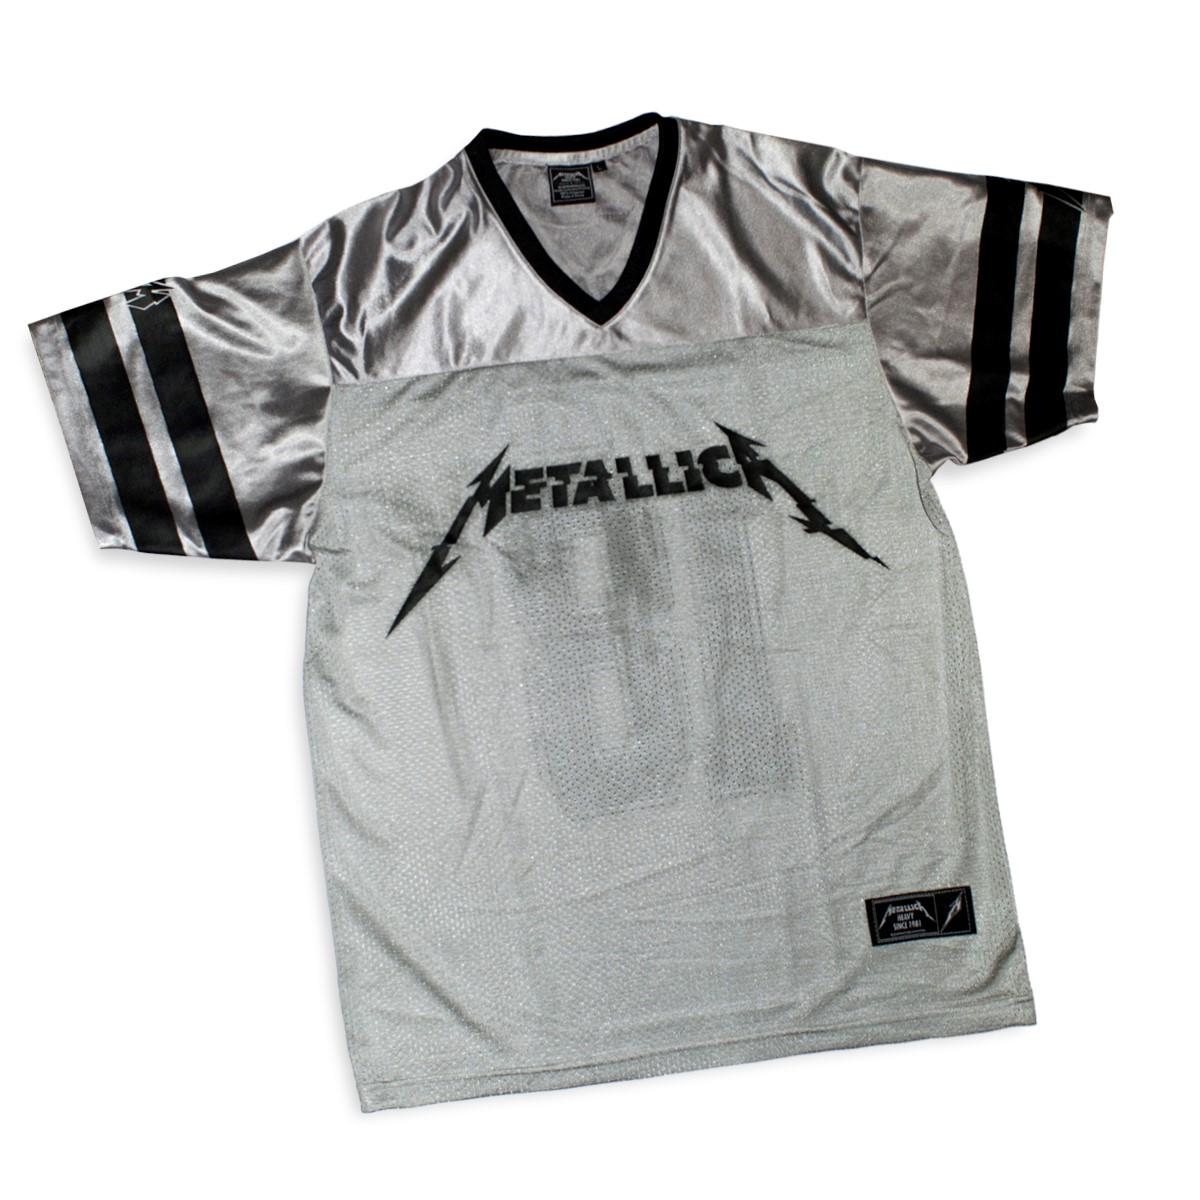 Hardwired 18 – Grey Mesh Sports Jersey - Metallica